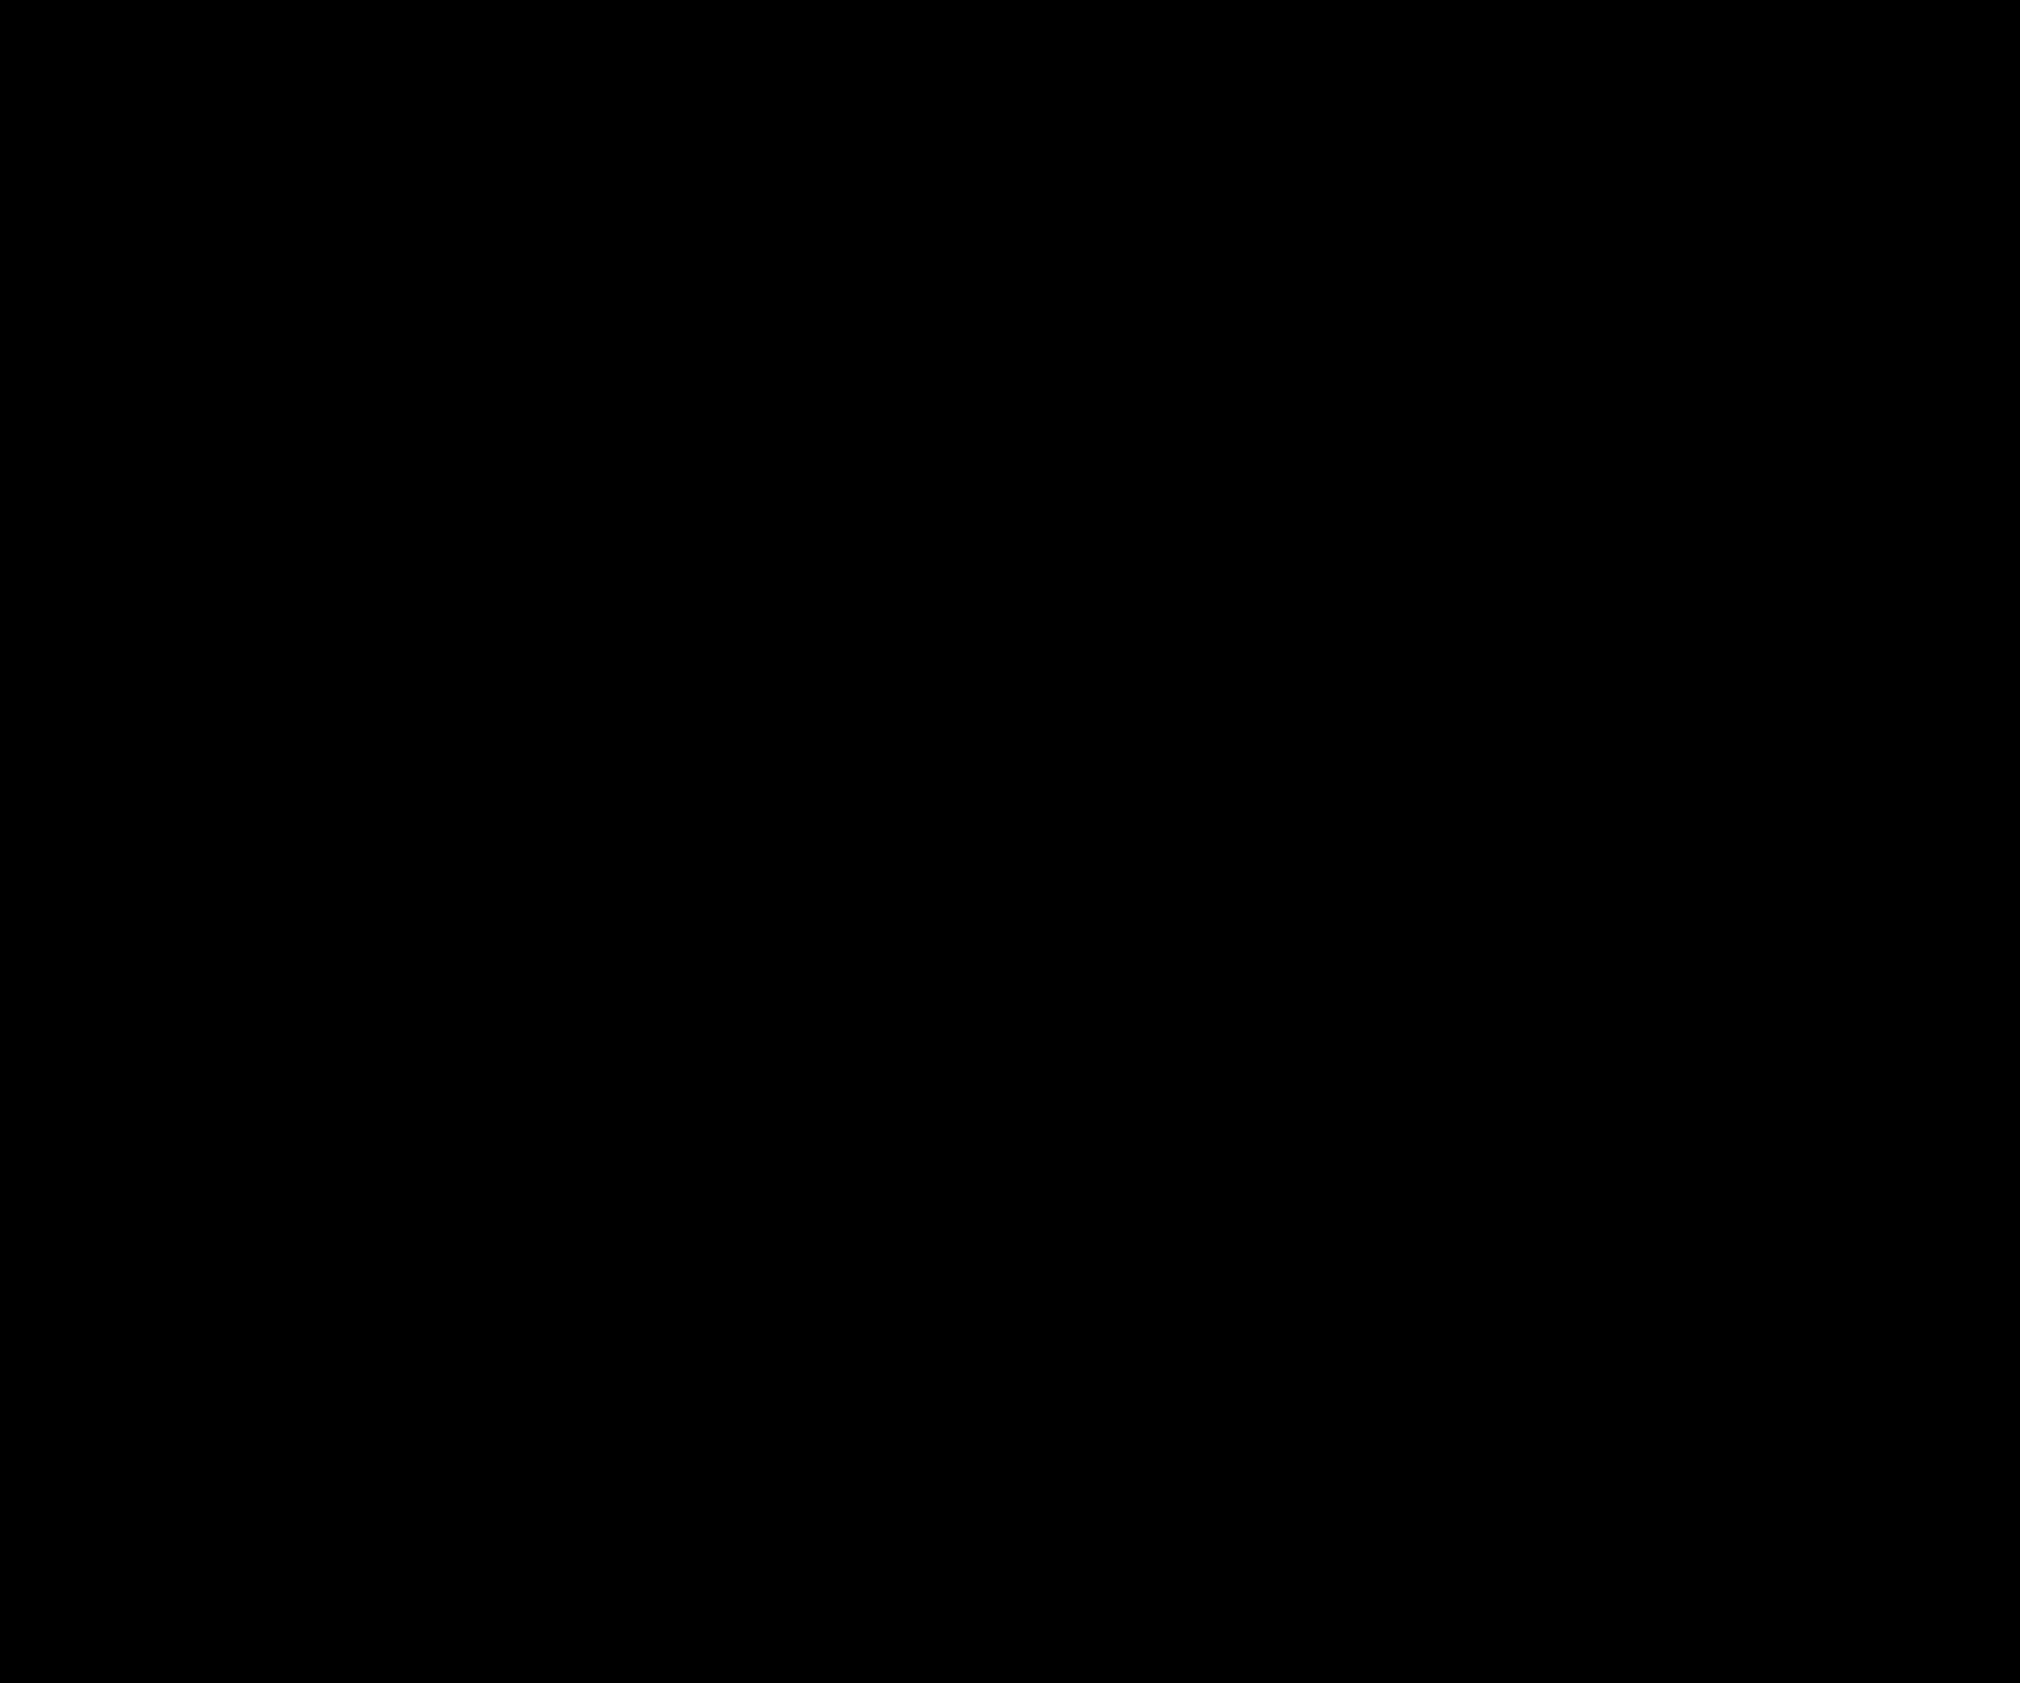 Jackal Clipart.